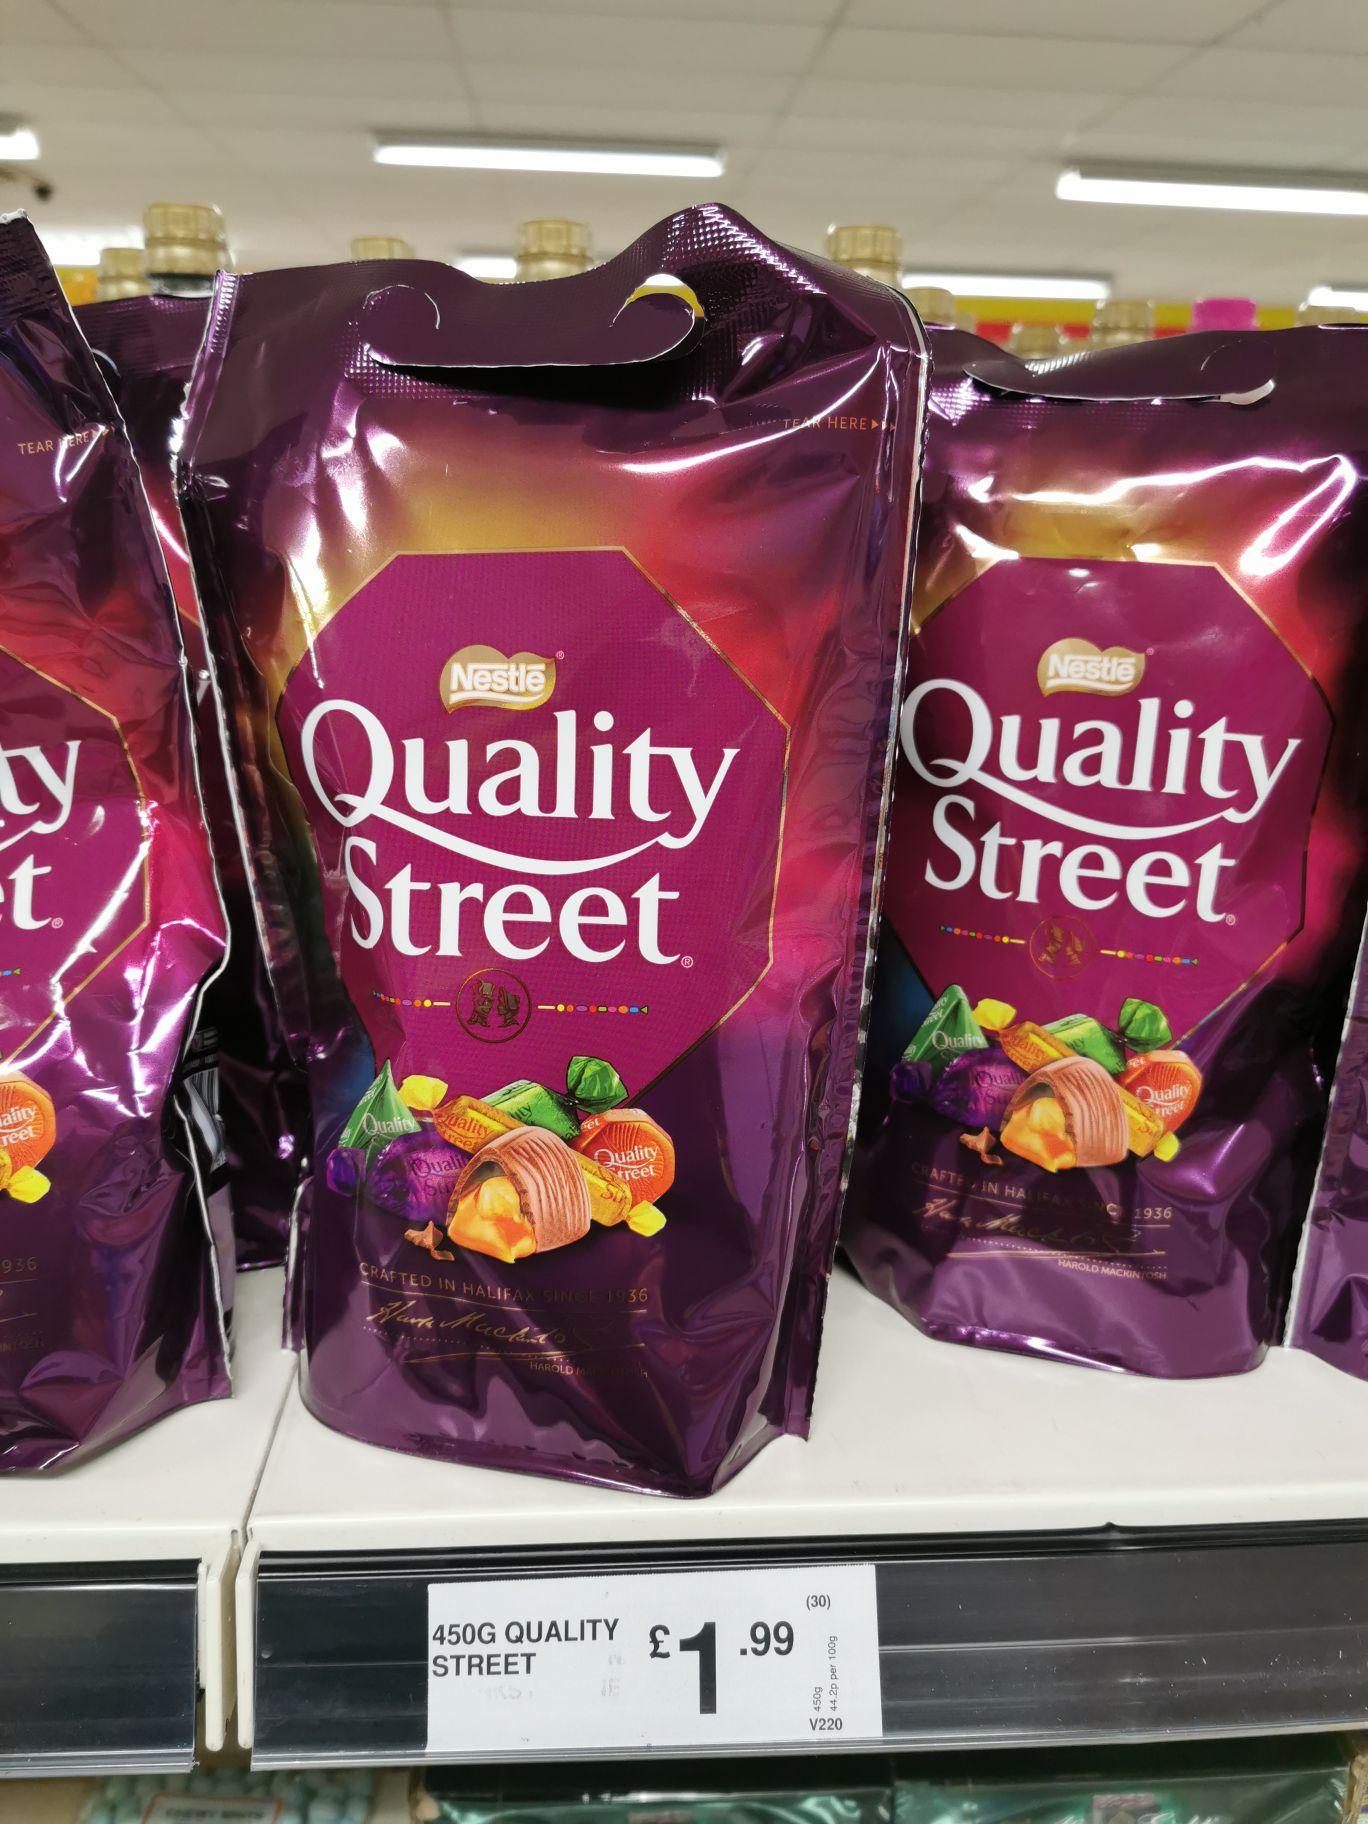 Quality Street Chocolates 450g £1.99 at FarmFoods Birmingham